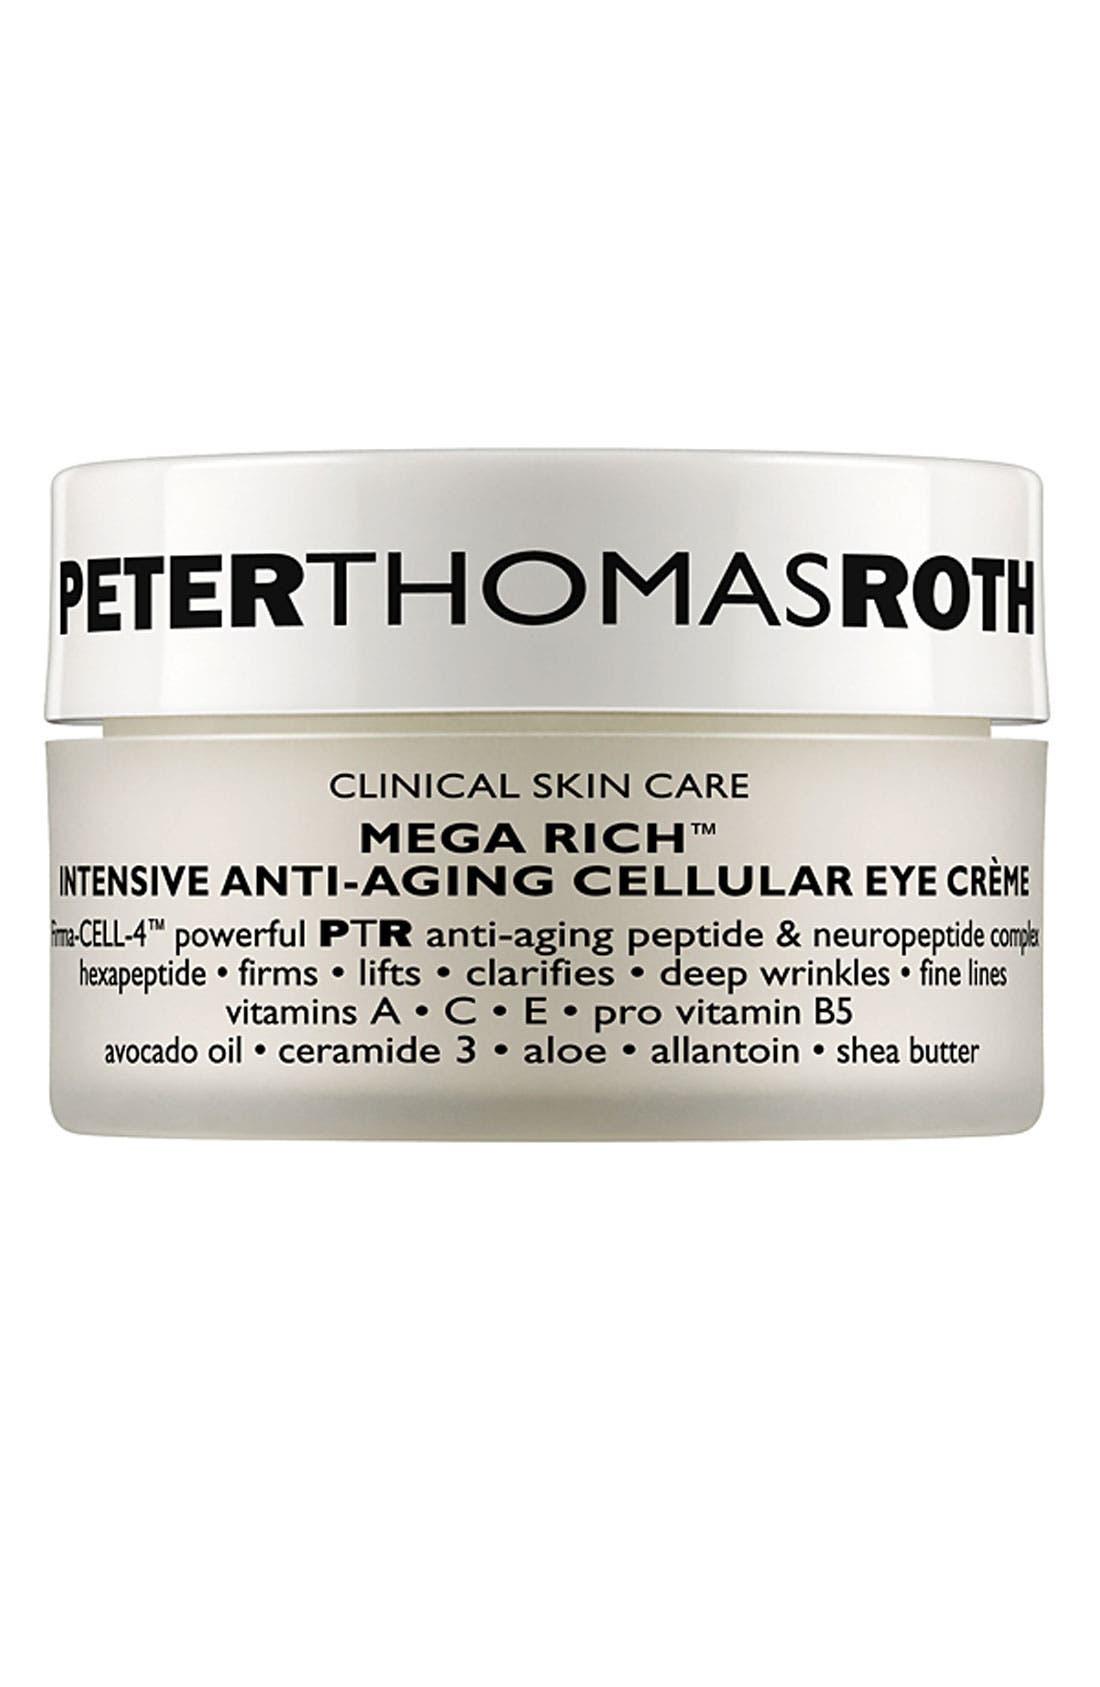 Mega Rich Intensive Anti-Aging Cellular Eye Crème,                         Main,                         color, 000